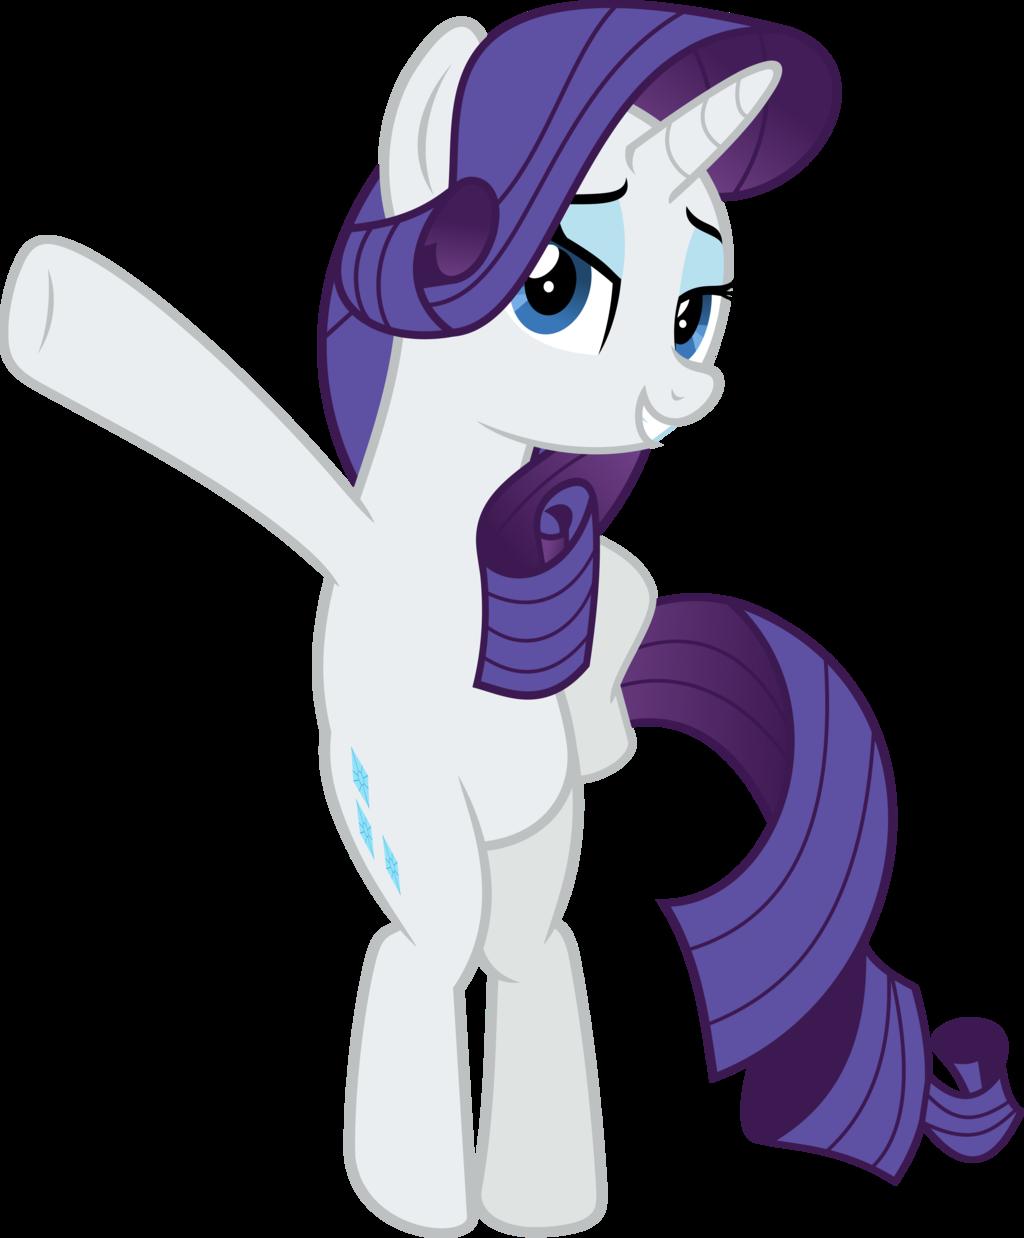 MLP Vector - Rarity #7 by jhayarr23 | My little pony ...